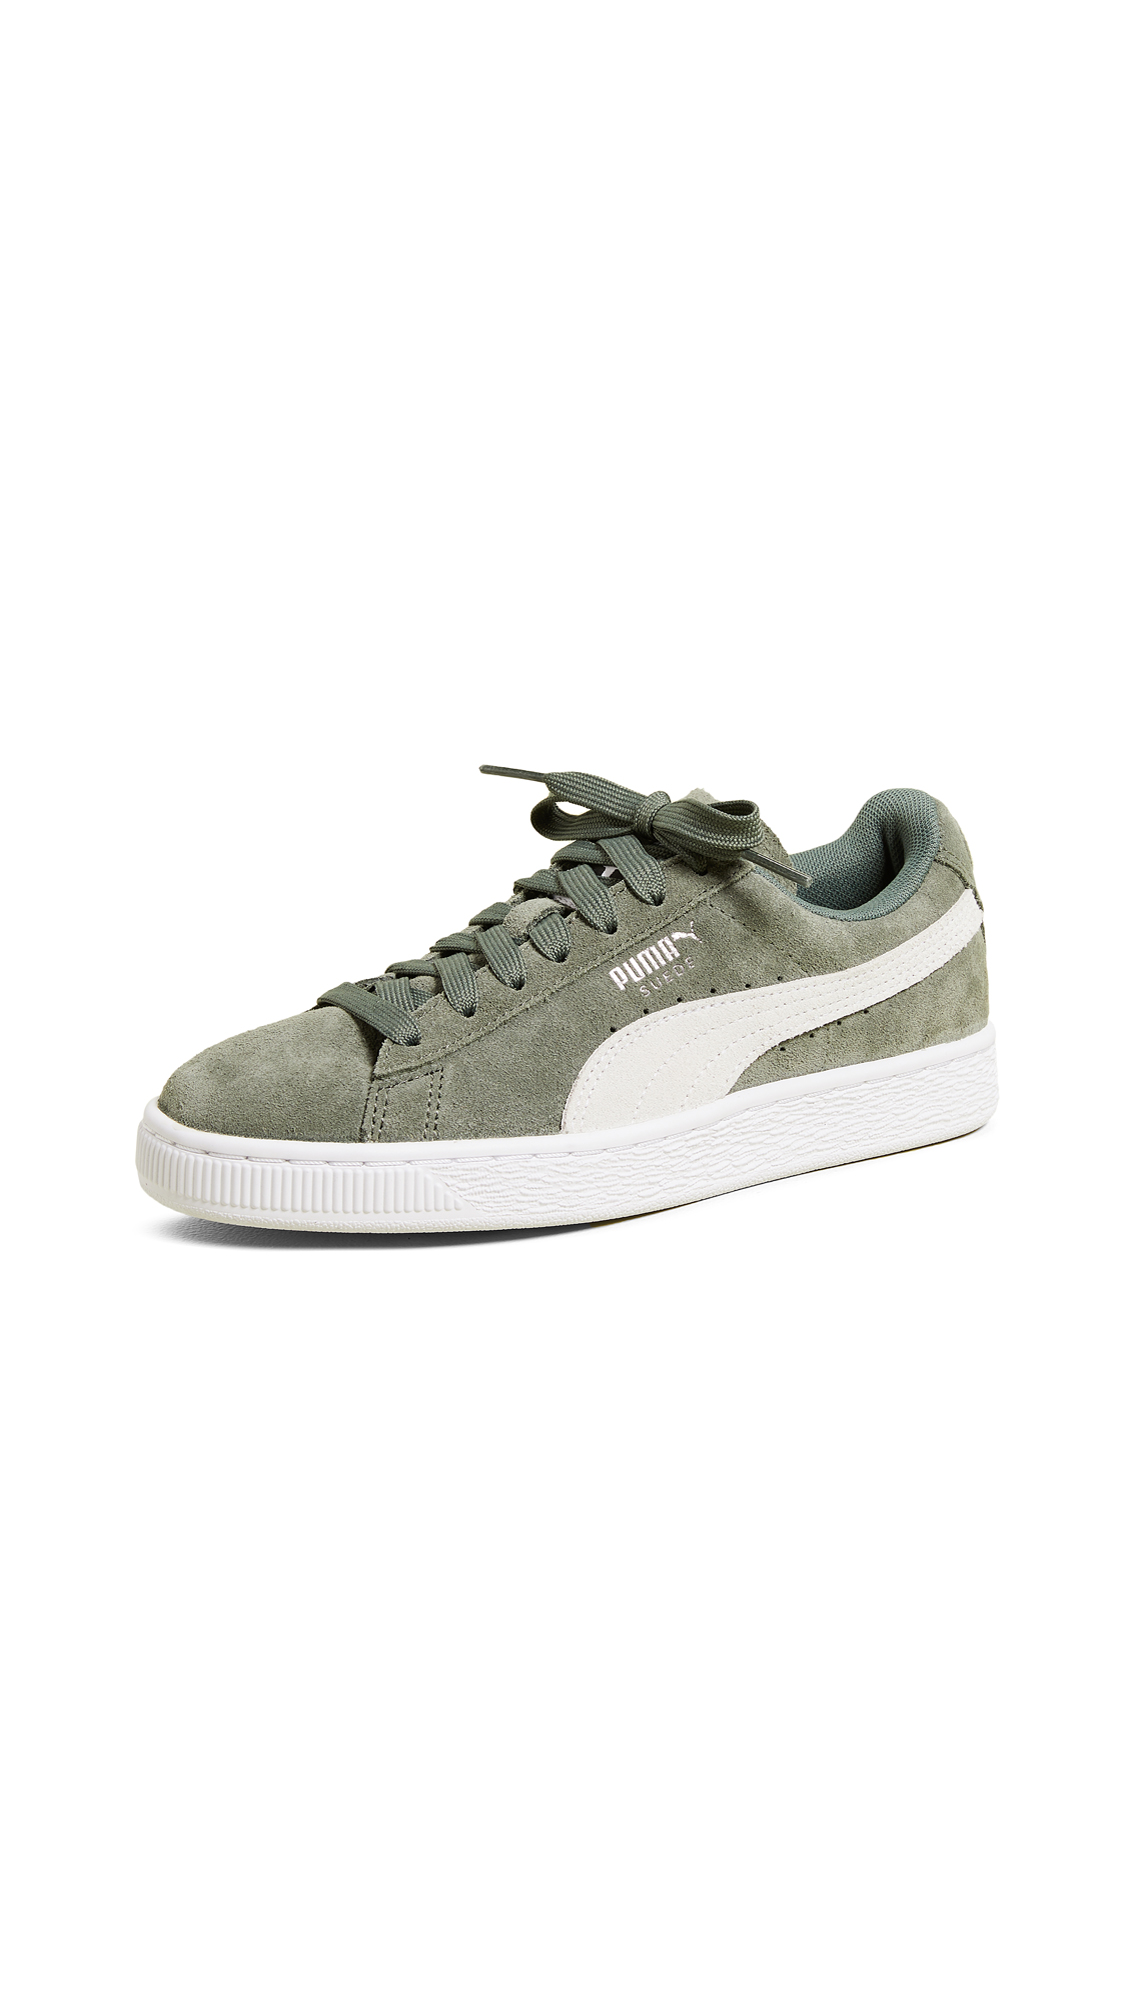 PUMA Suede Classic Sneakers - Laurel Wreath/Puma White